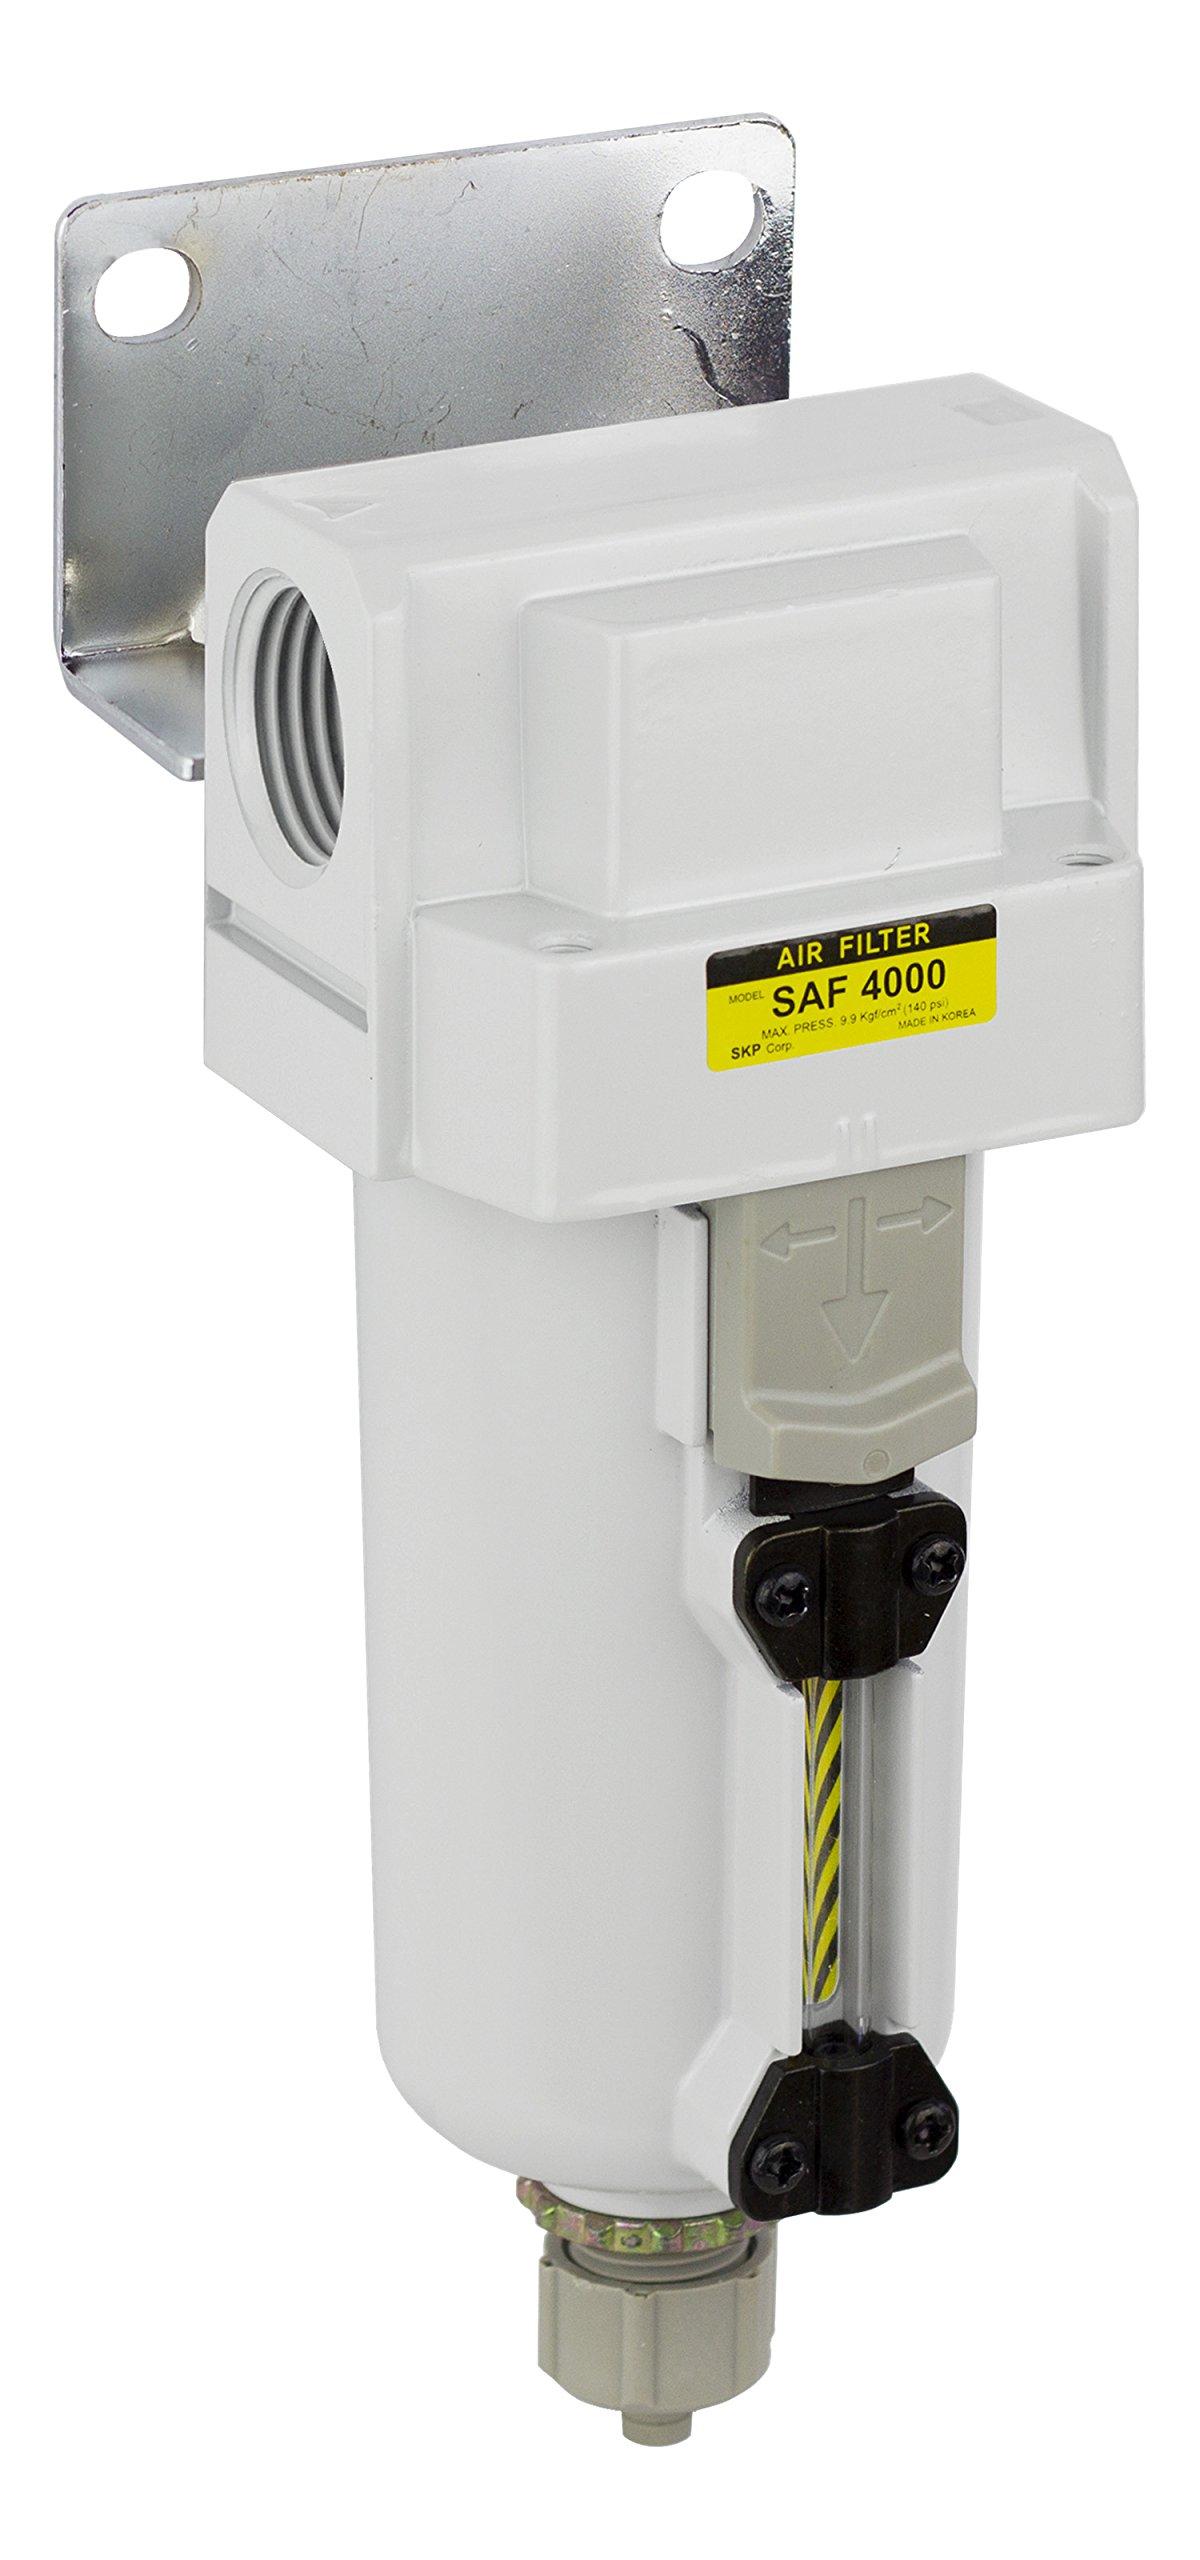 PneumaticPlus SAF4000M-N06B-MEP Compressed Air Particulate Filter, 3/4'' NPT, Manual Drain, Metal Bowl, 10 μm